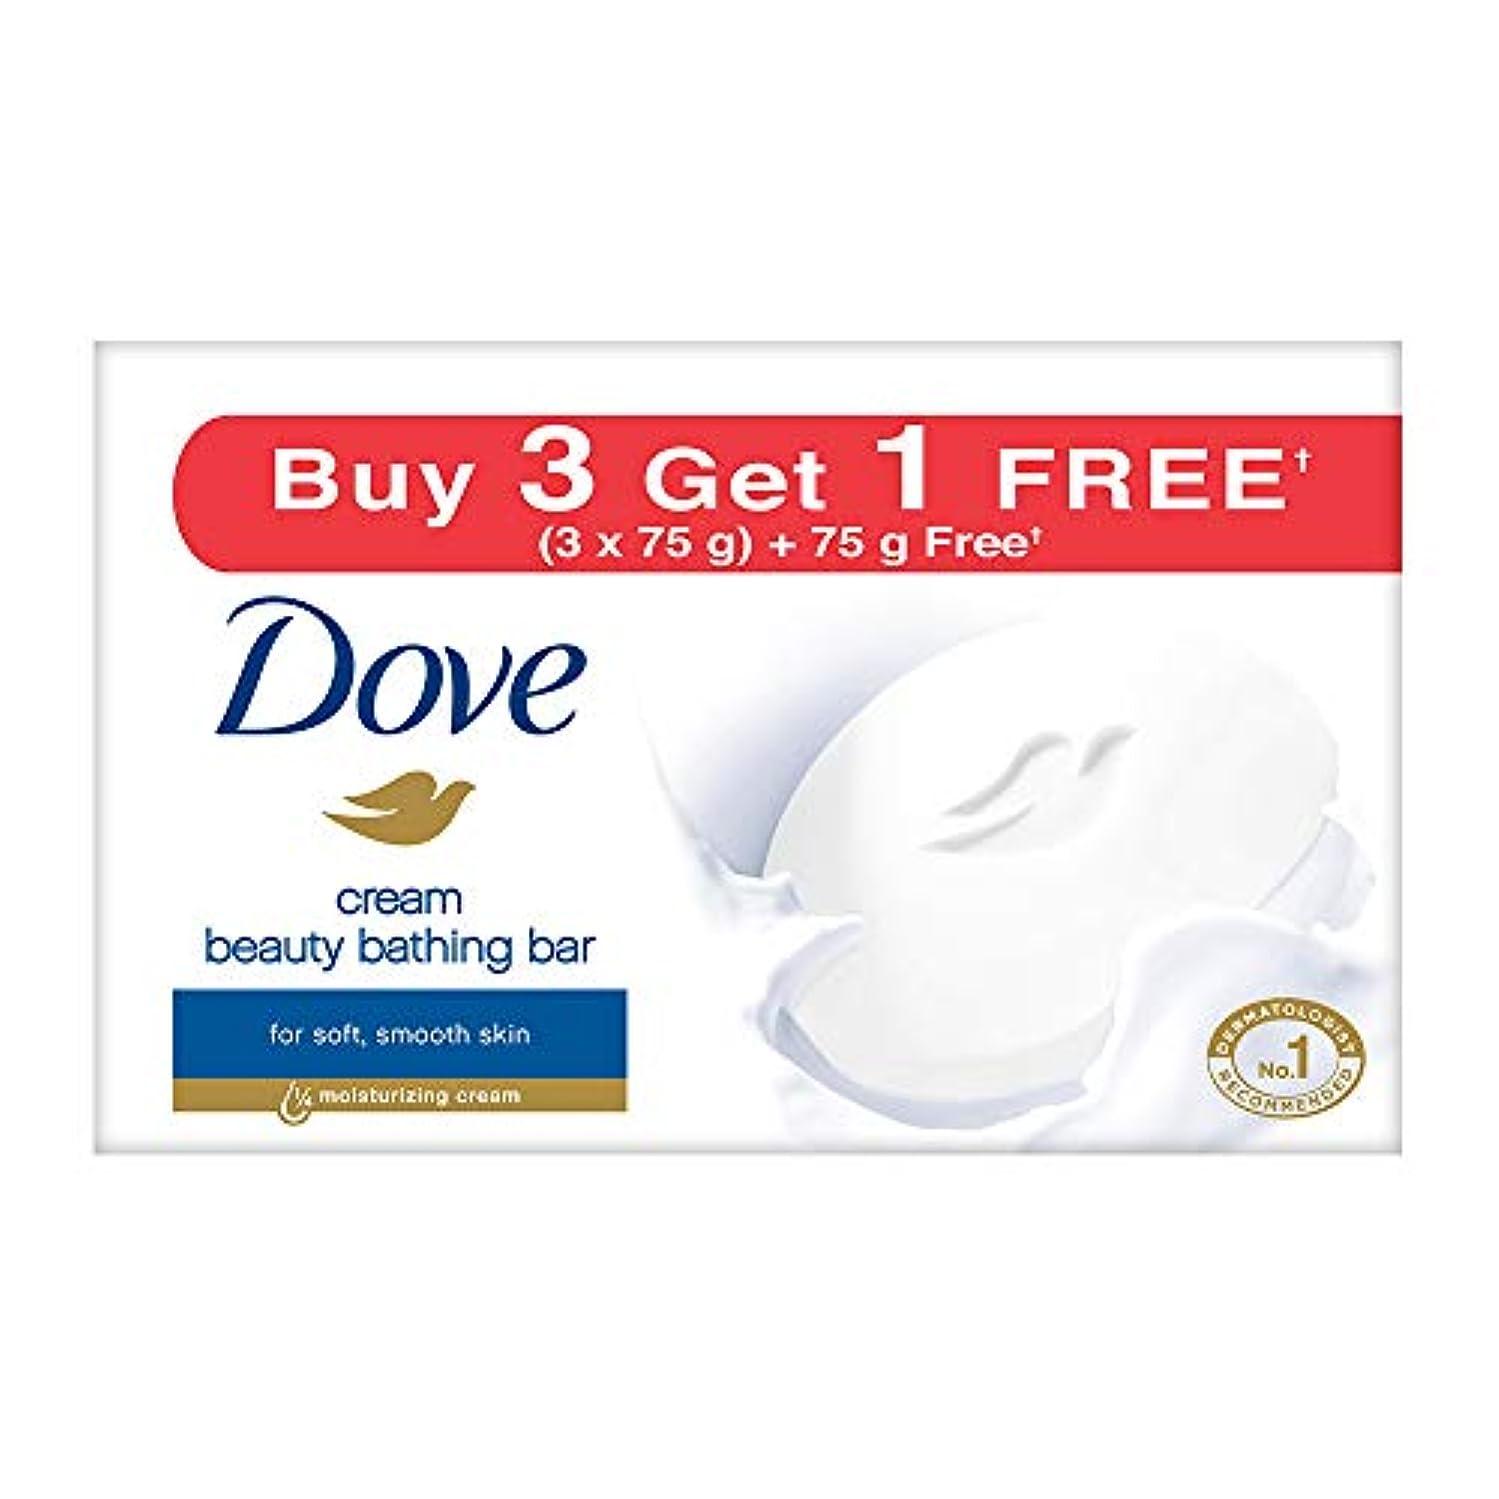 Dove Cream Beauty Bathing Bar, 4x75g